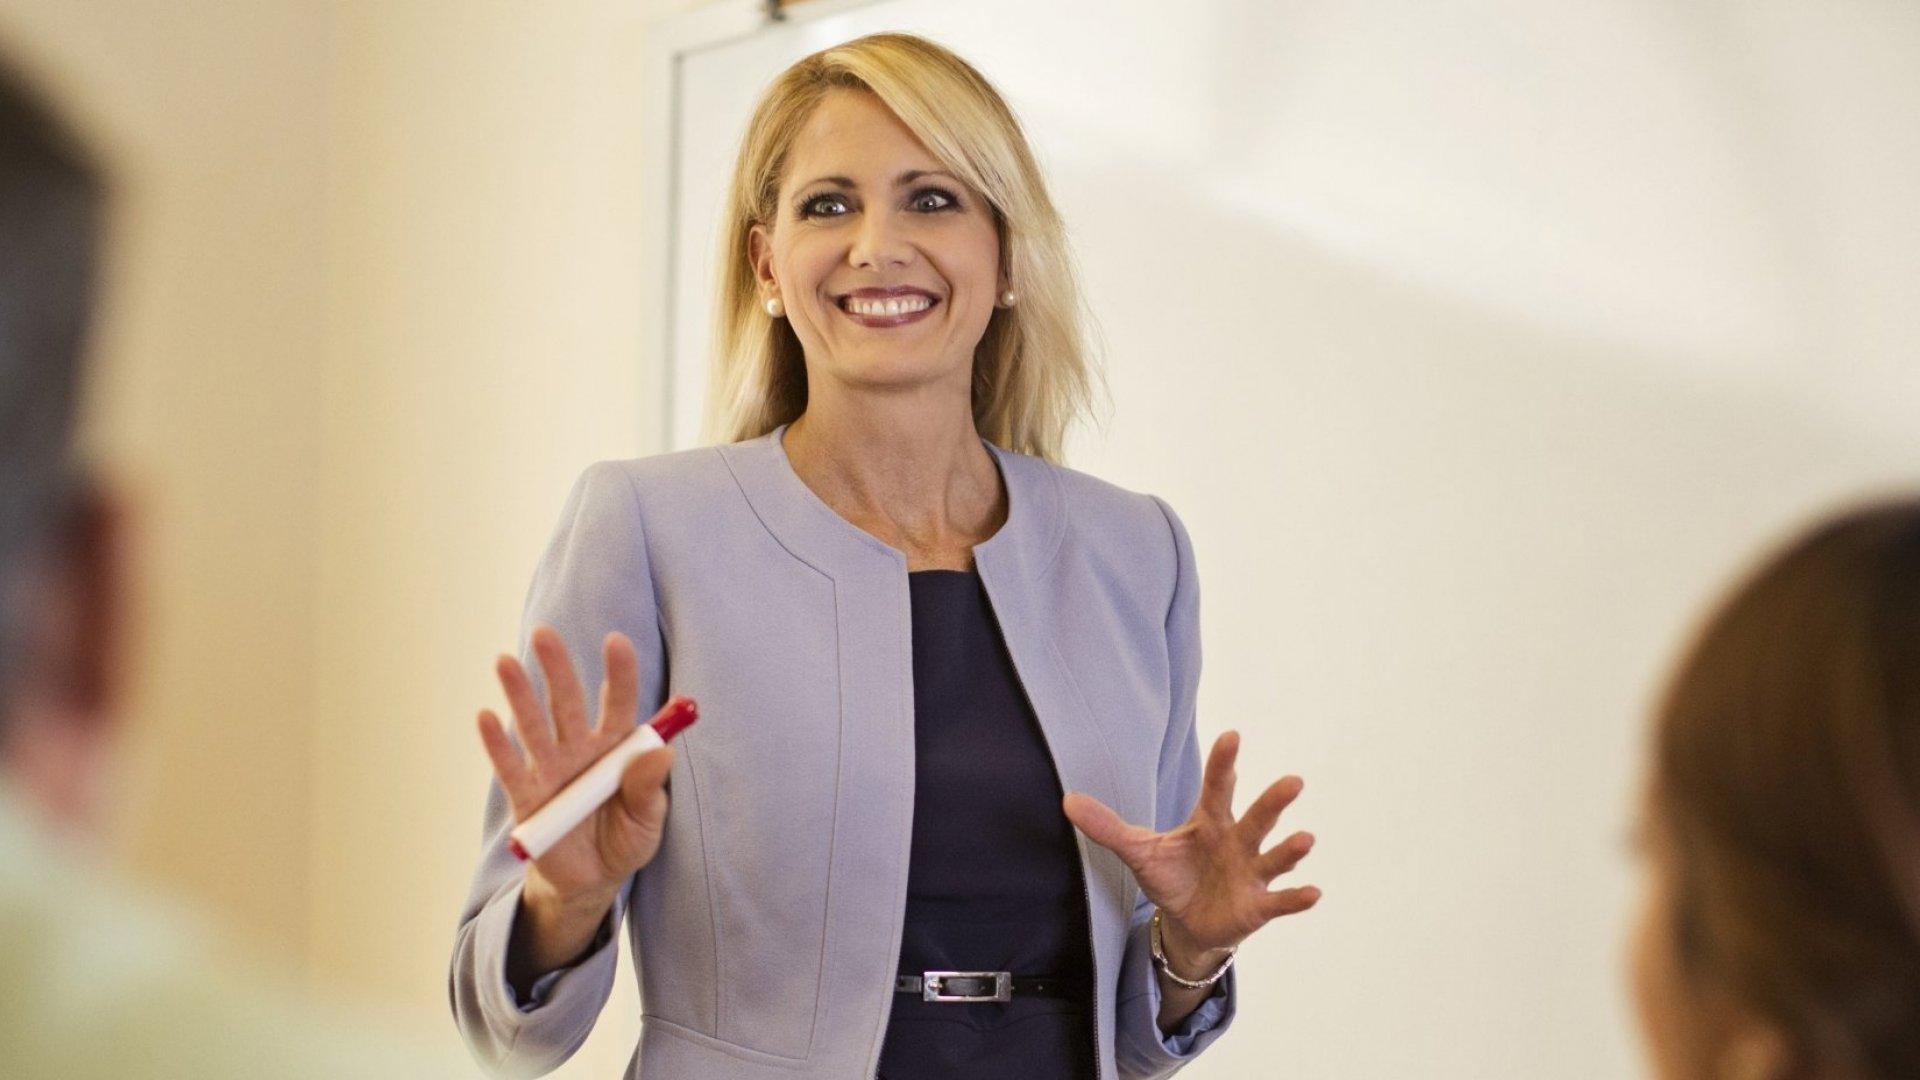 7 Mistakes That Are Holding Female Entrepreneurs Back